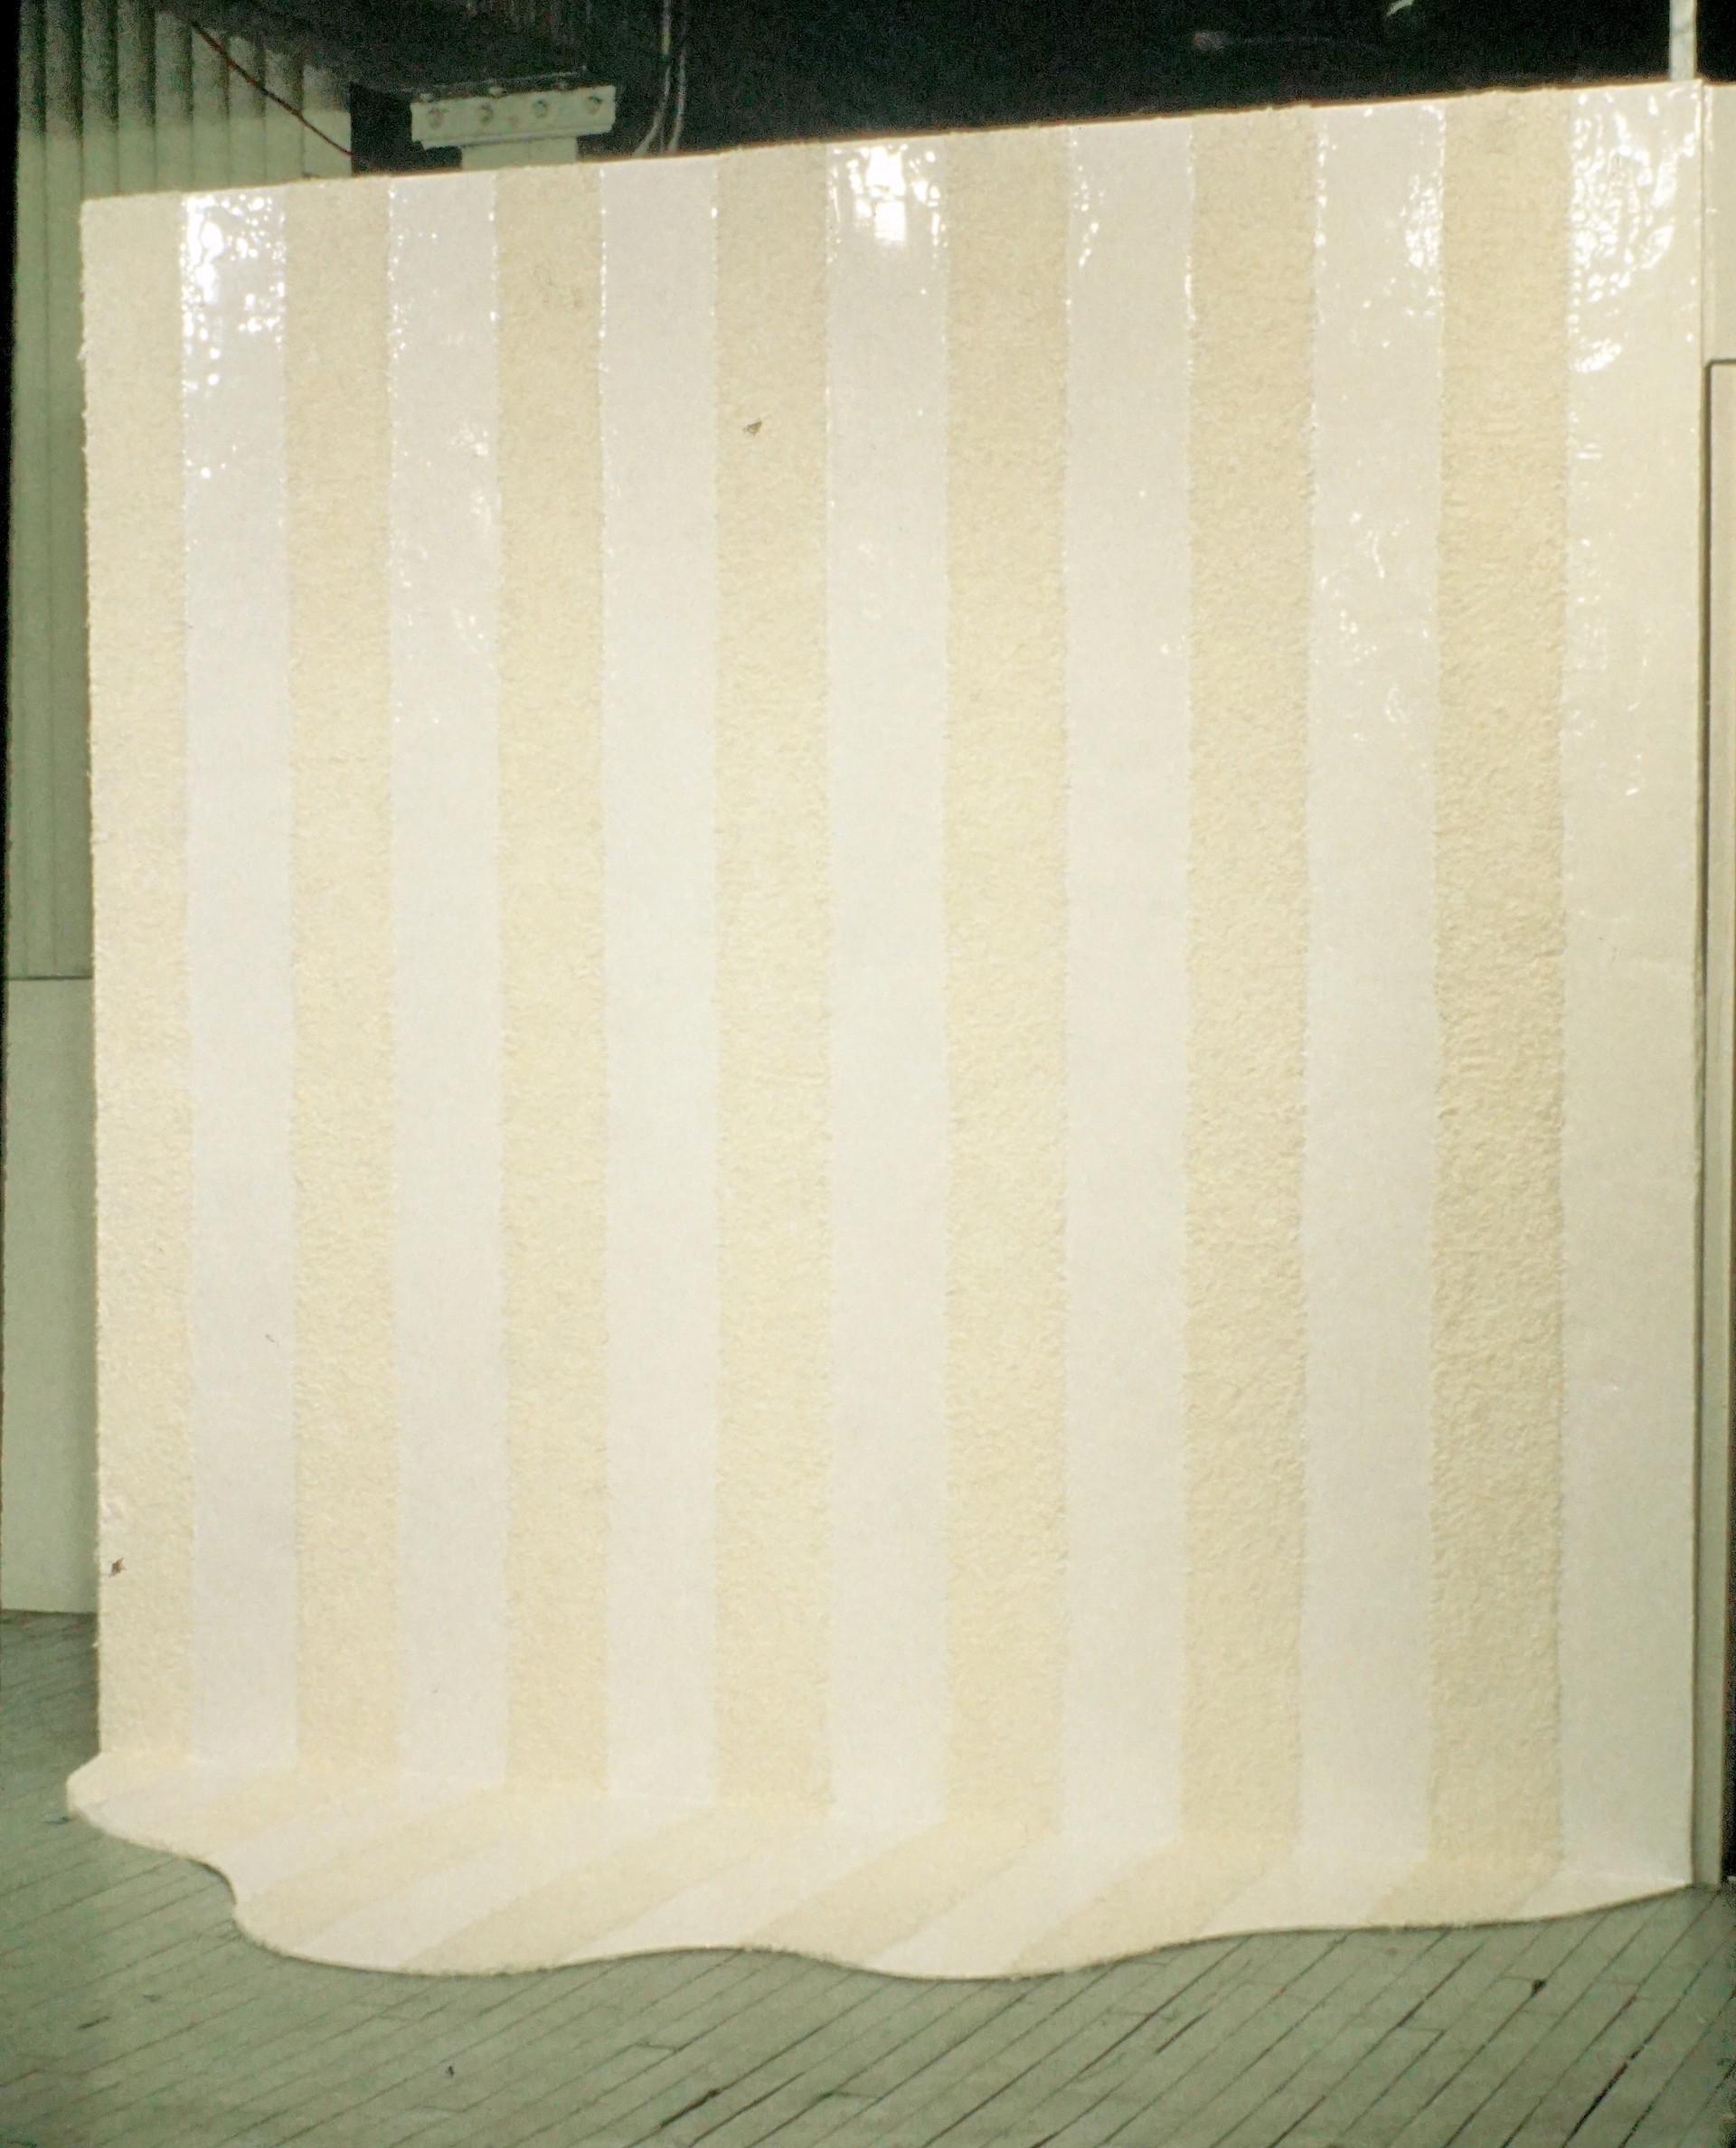 Coconut Wall, 1998